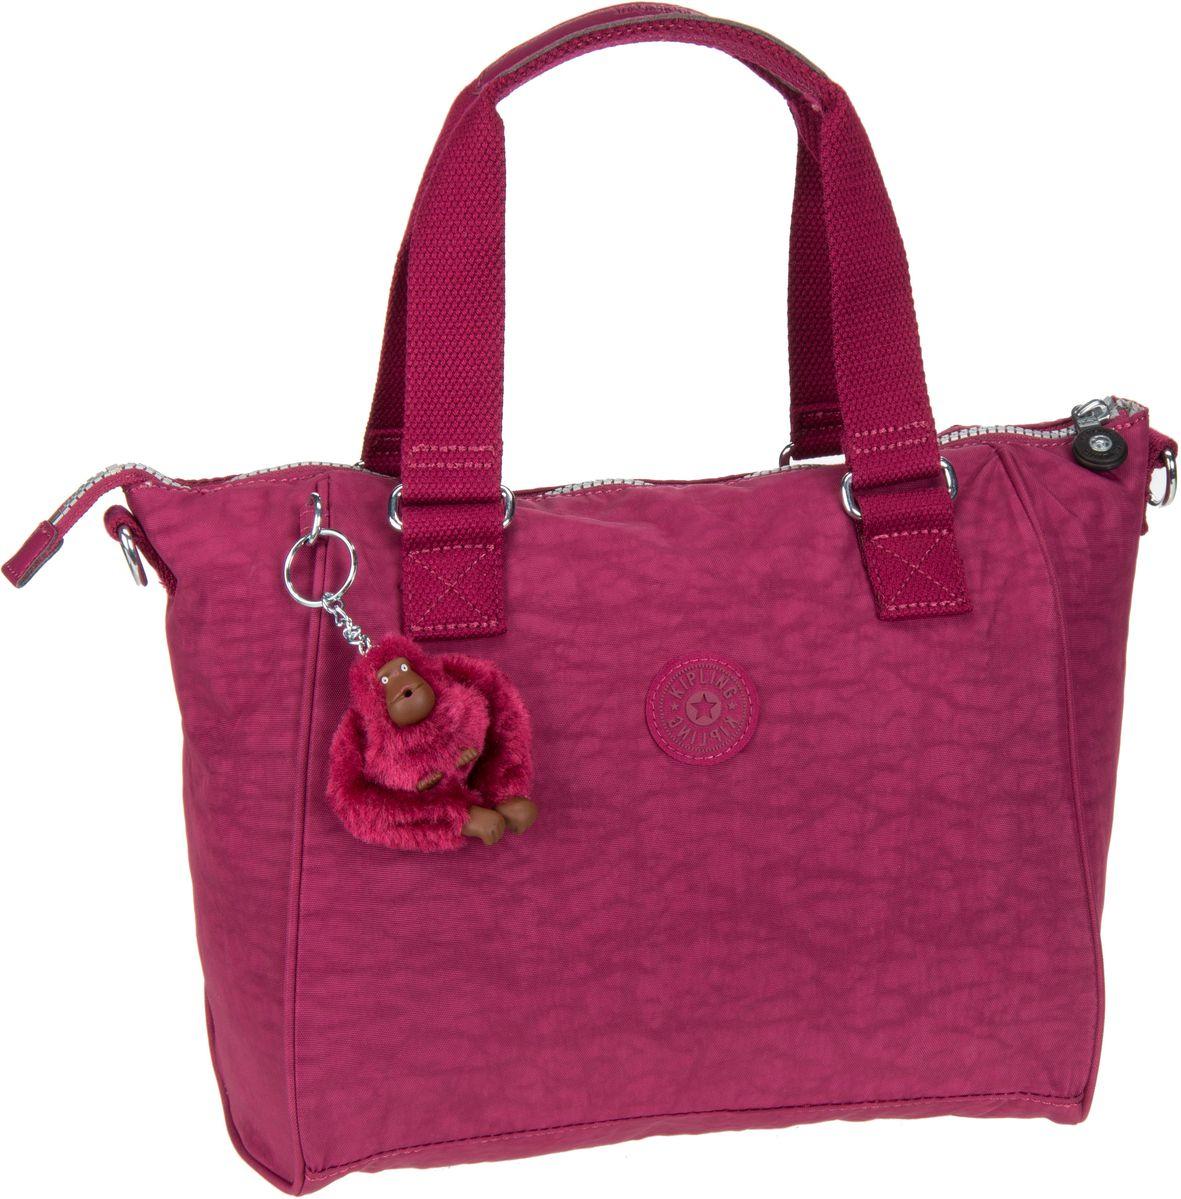 Gablenz Angebote Kipling Amiel Berry - Handtasche